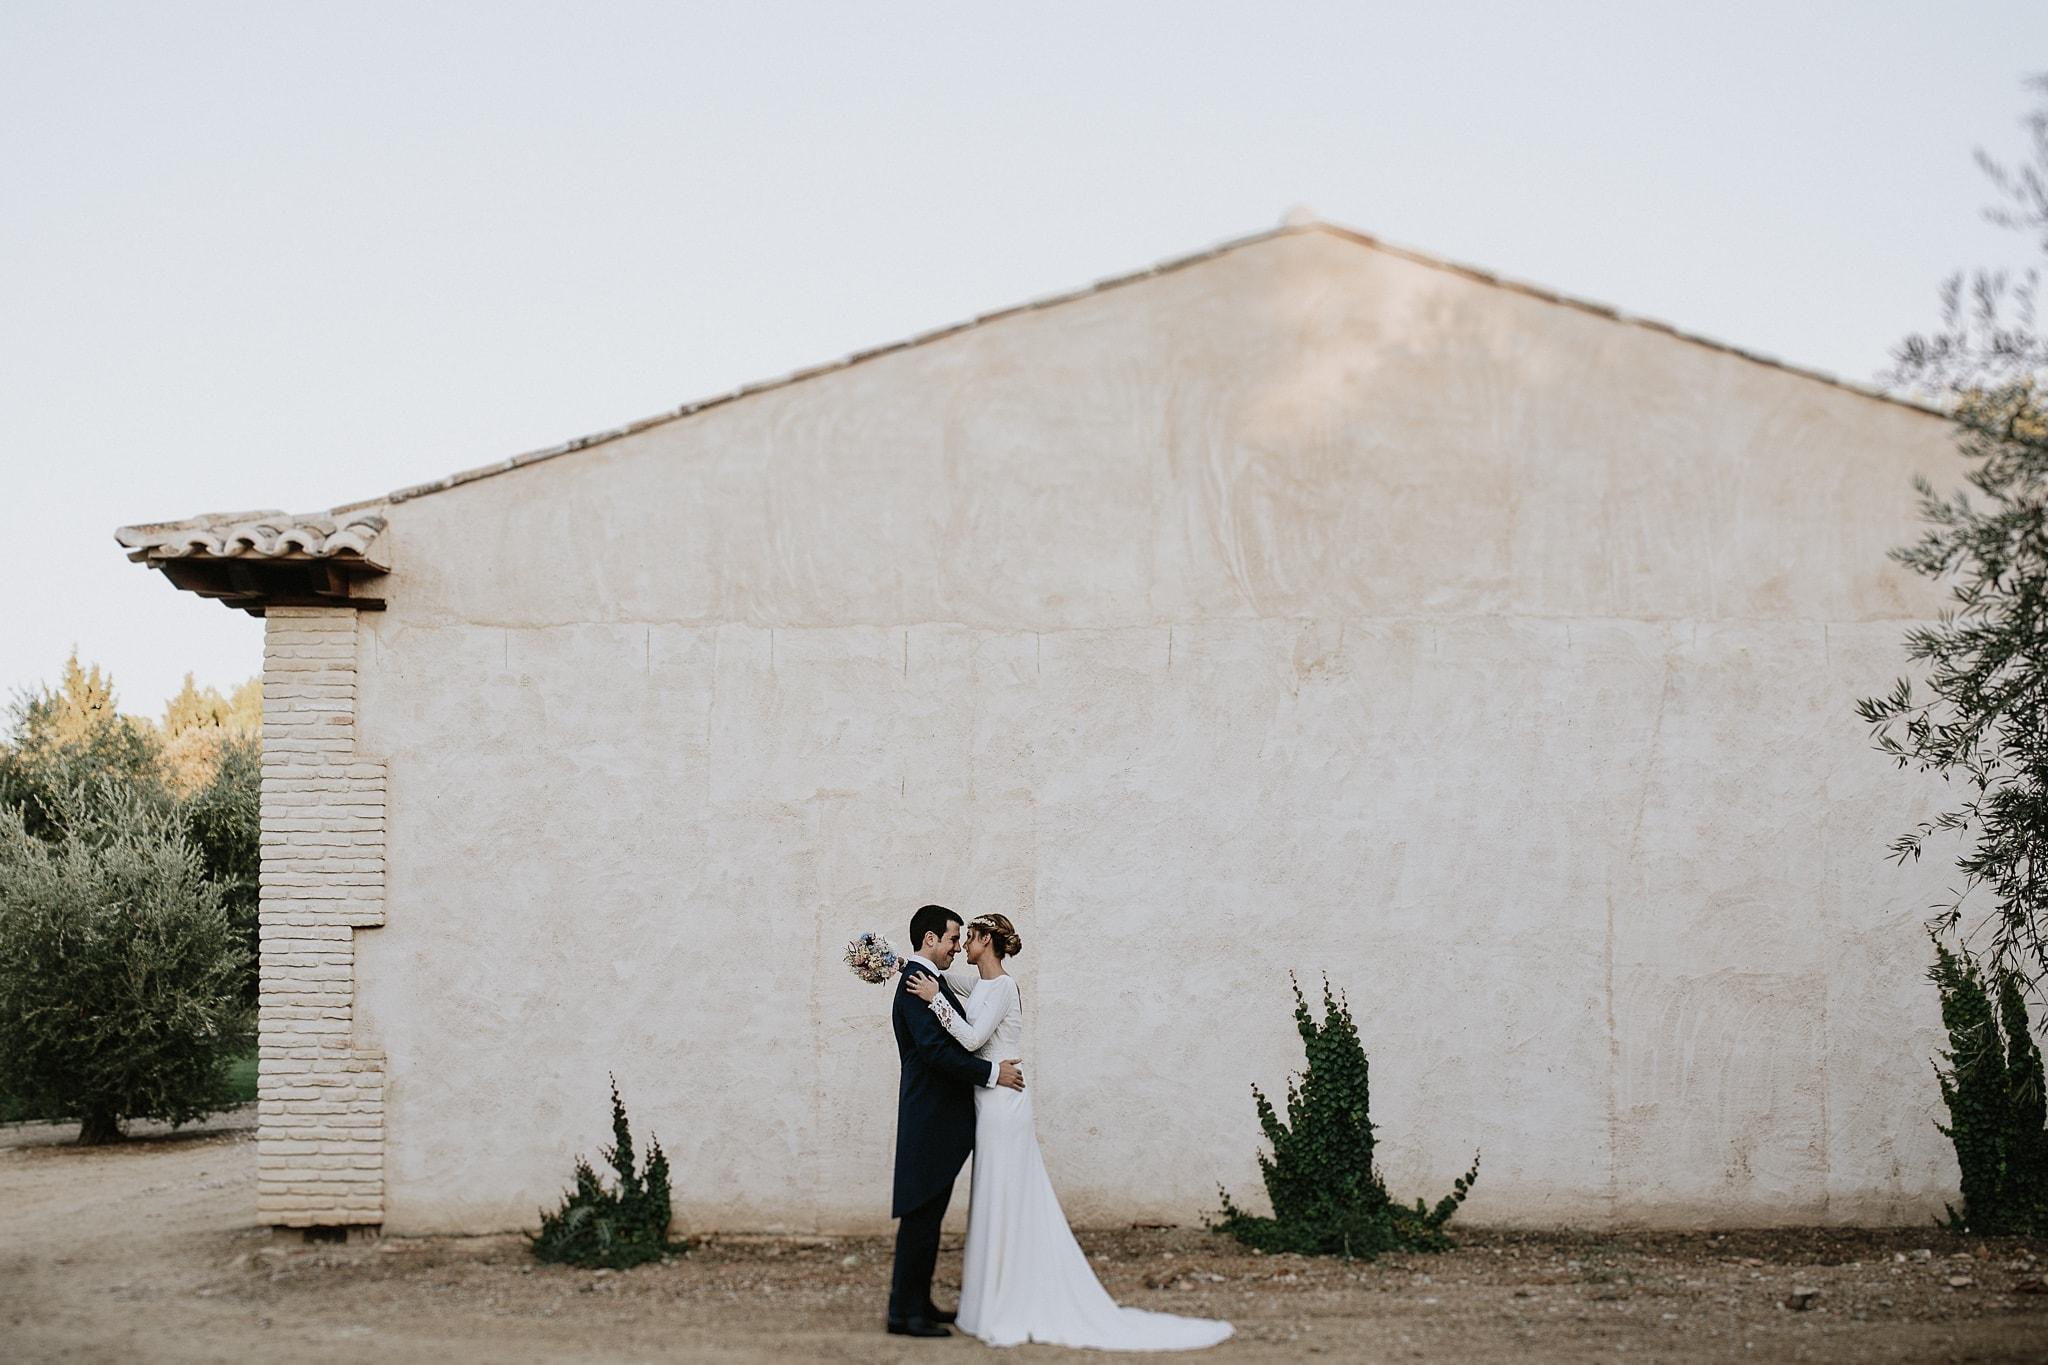 prisma-blanco-fotografos-bodas-toledo-90